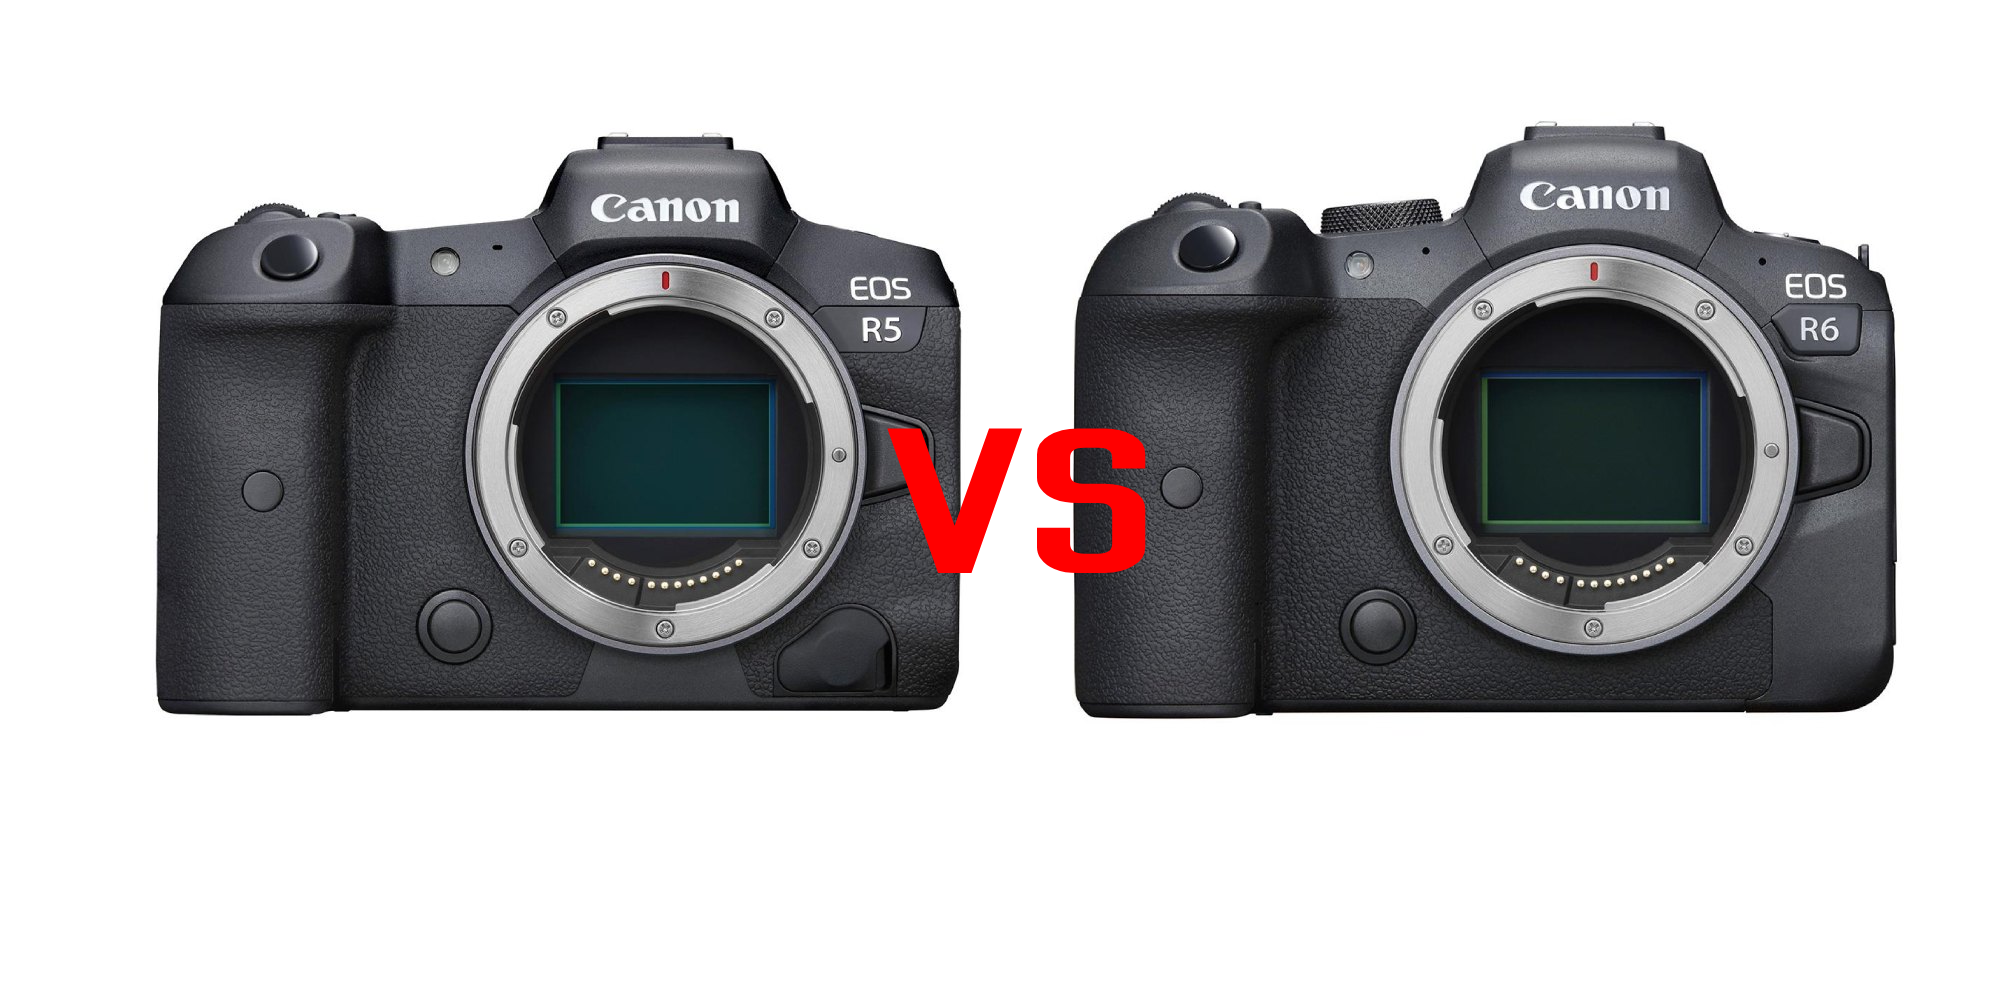 canon eos r5 vs eos r6 image